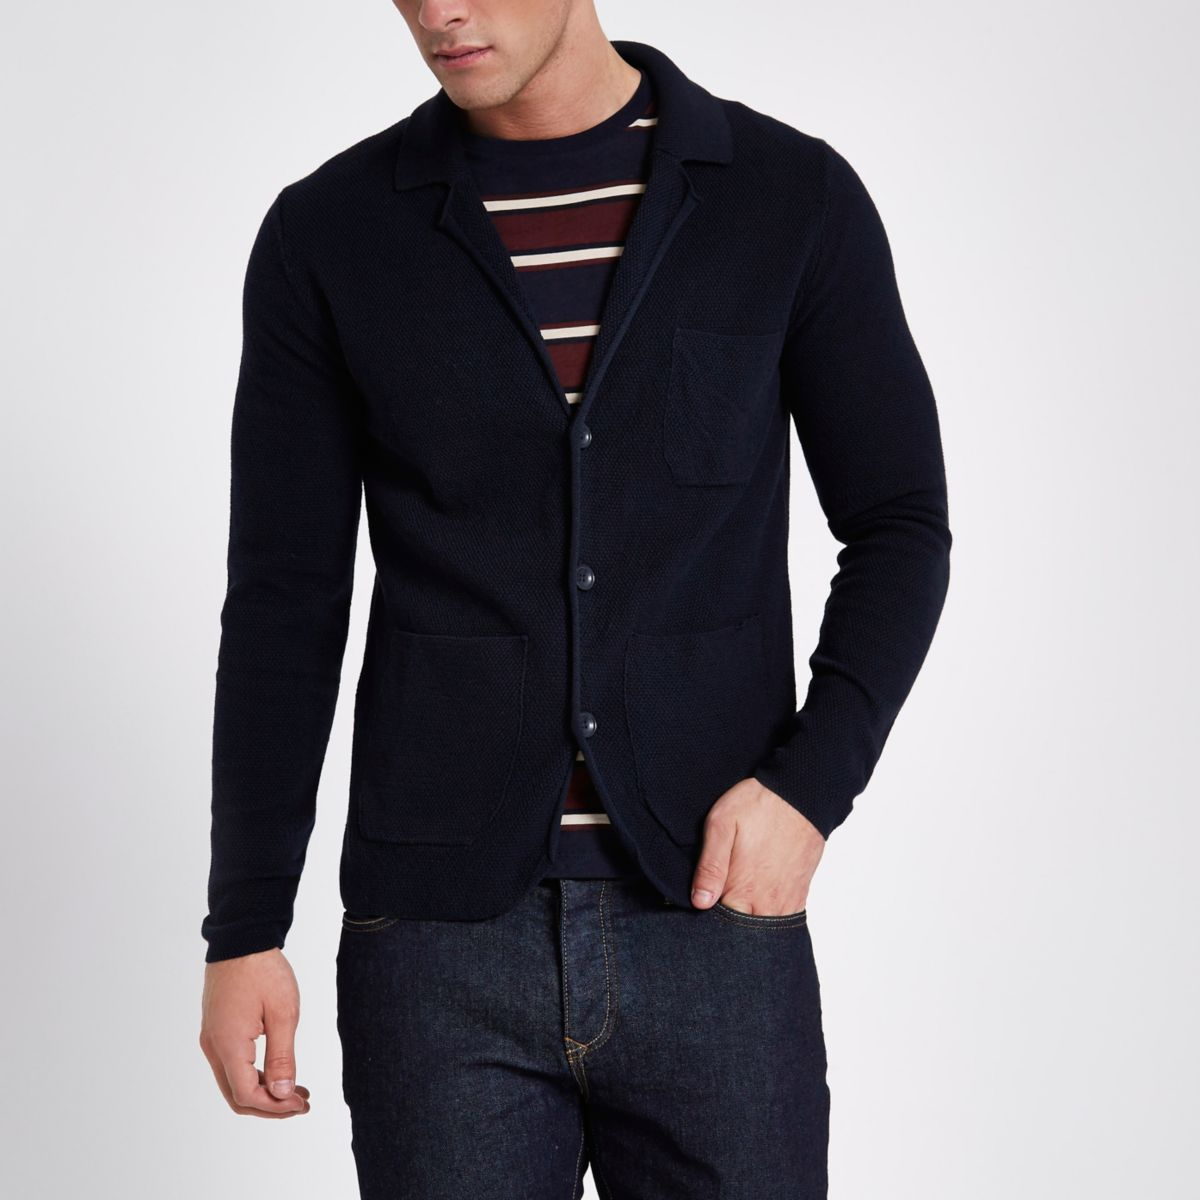 Only & Sons navy blazer knit cardigan